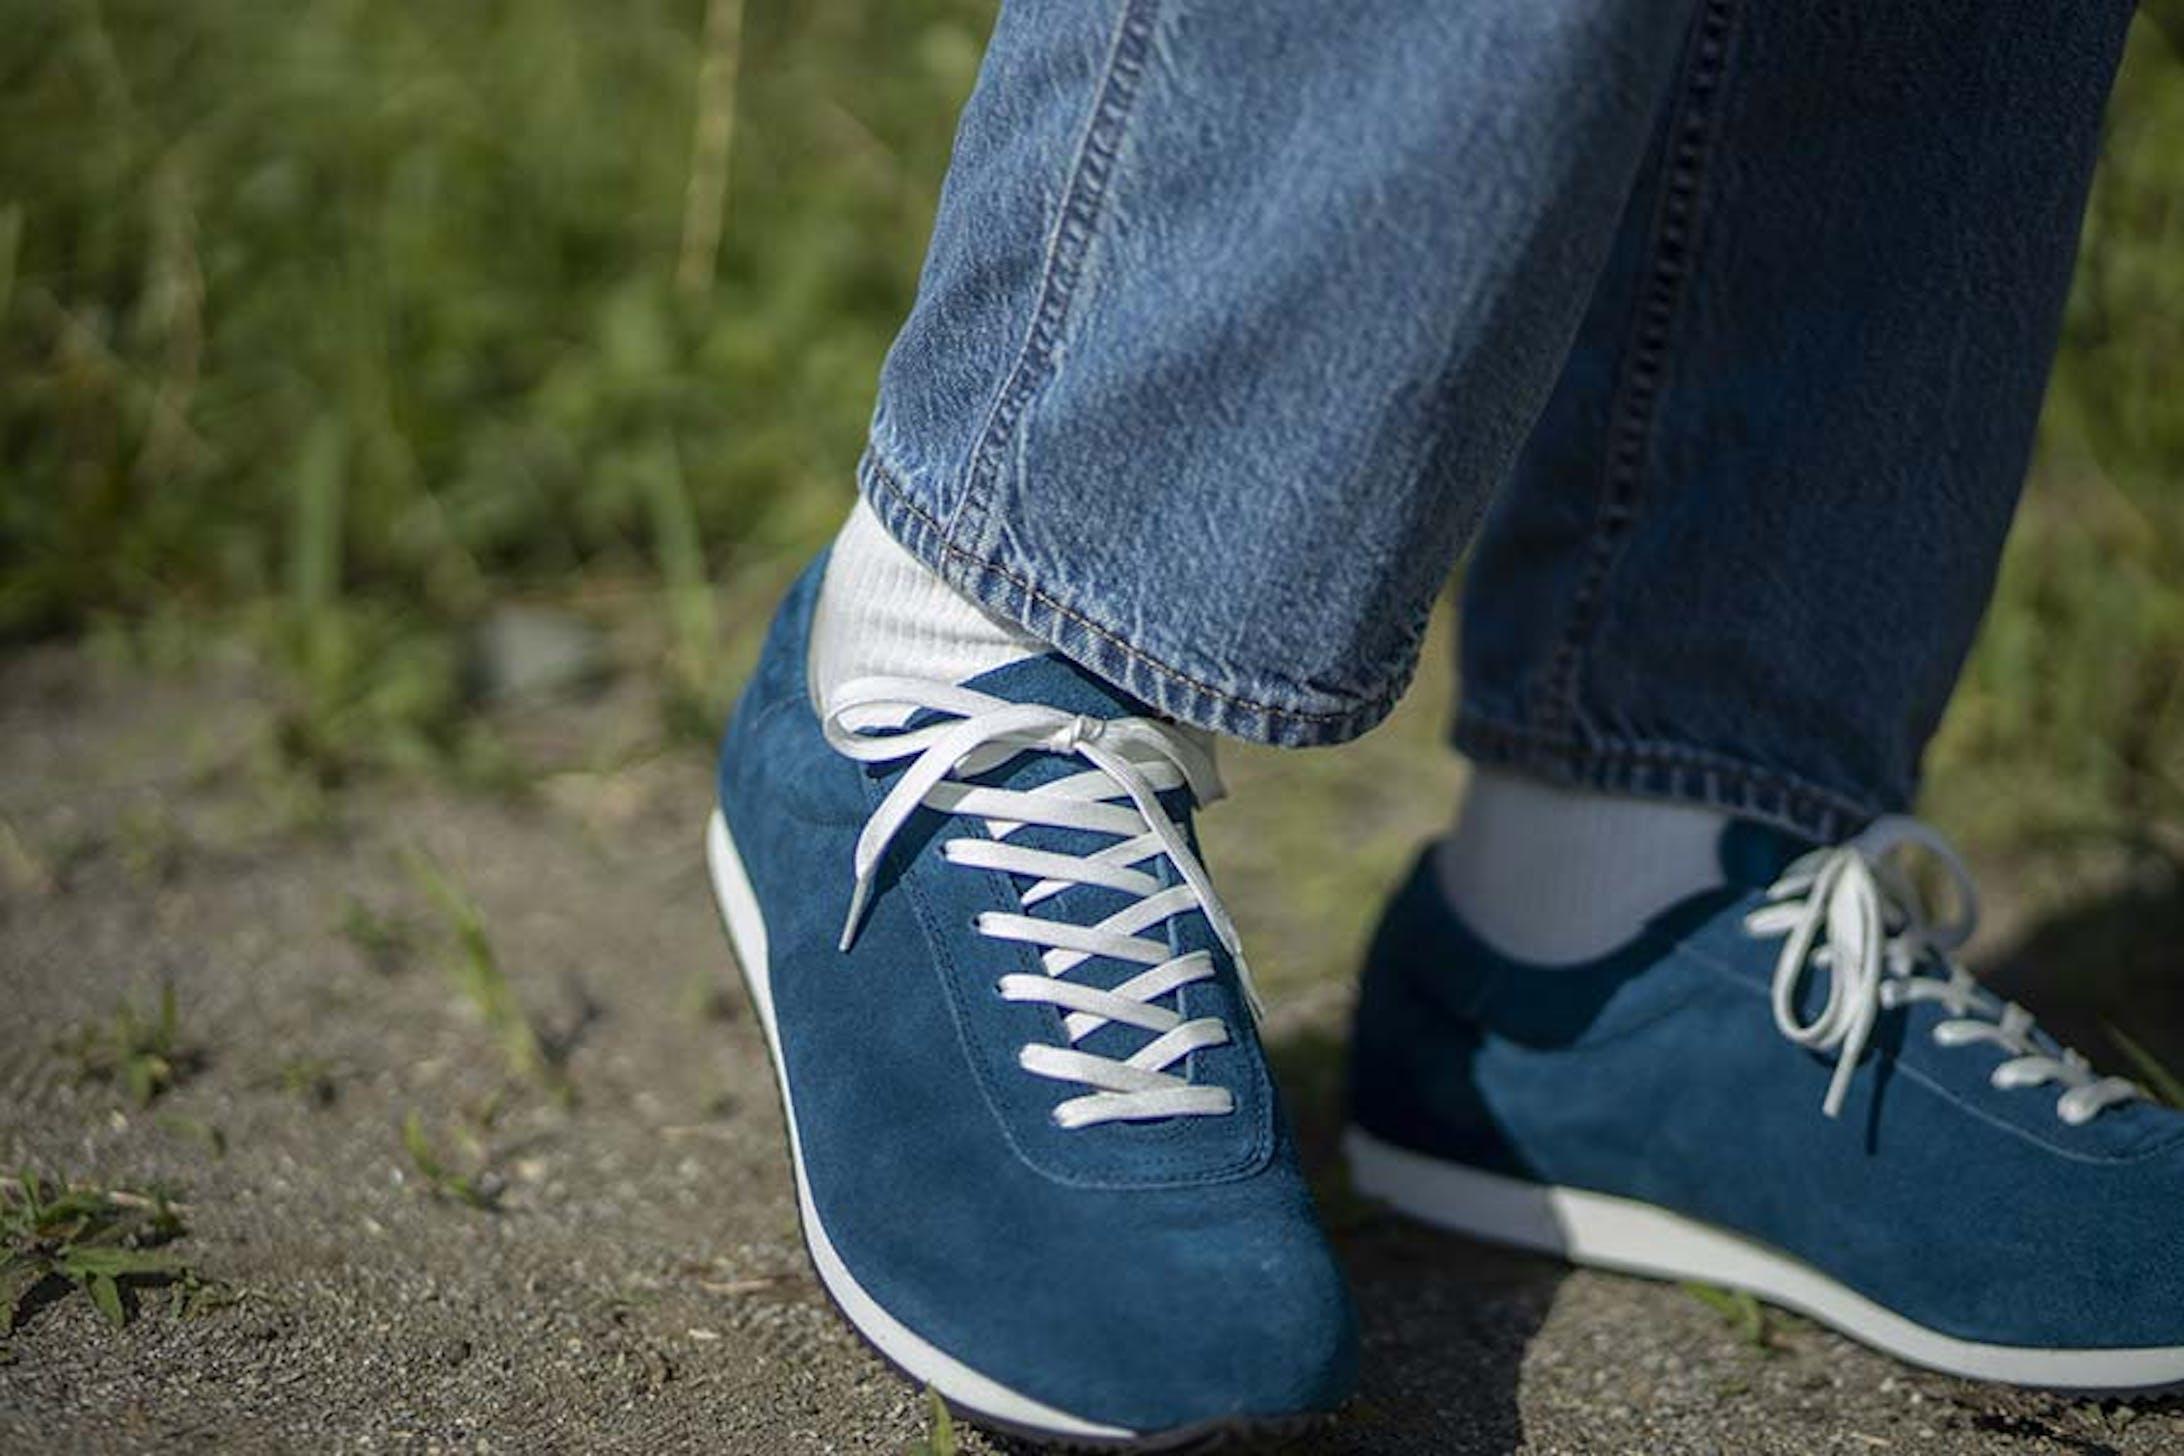 blueover|その靴いいね。どこの靴?-1